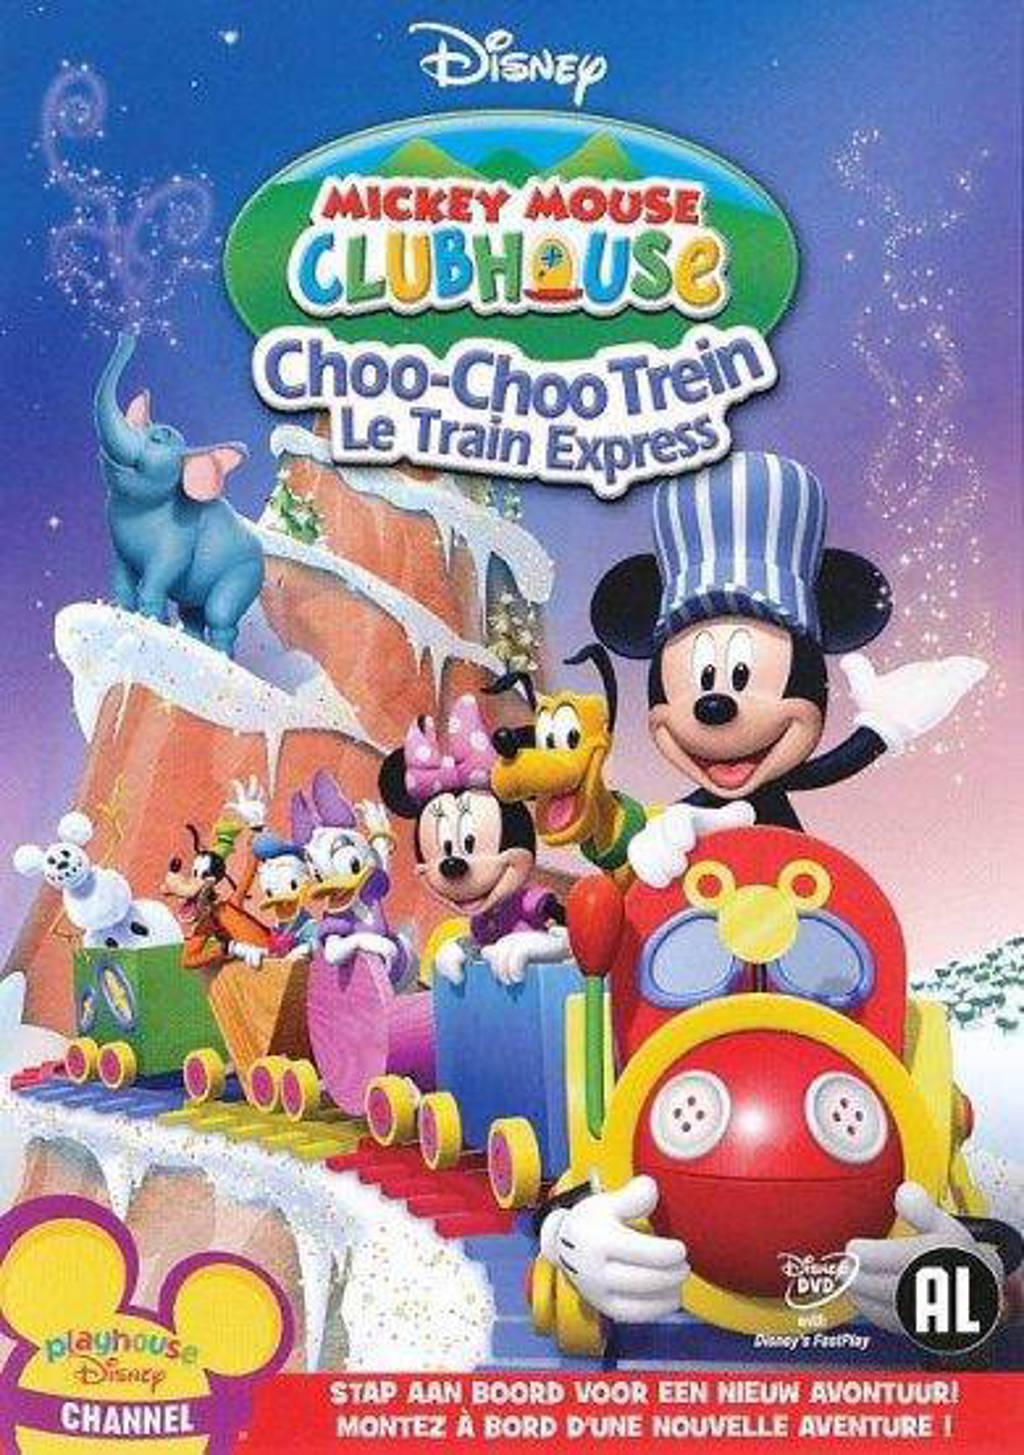 Mickey Mouse clubhouse - Choo-choo trein (DVD)